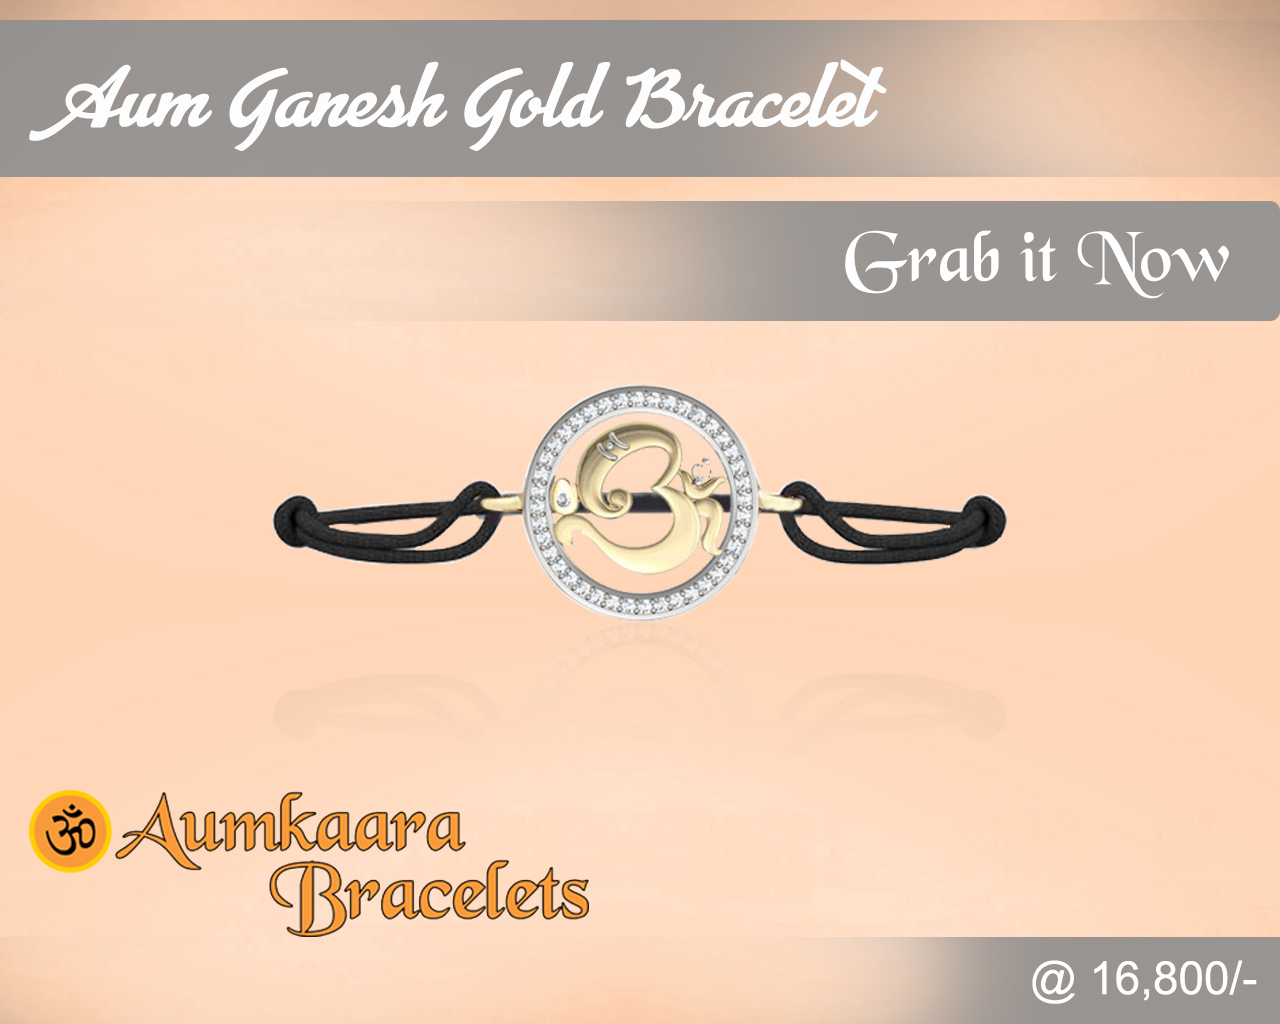 Aum Ganesh Gold Bracelet